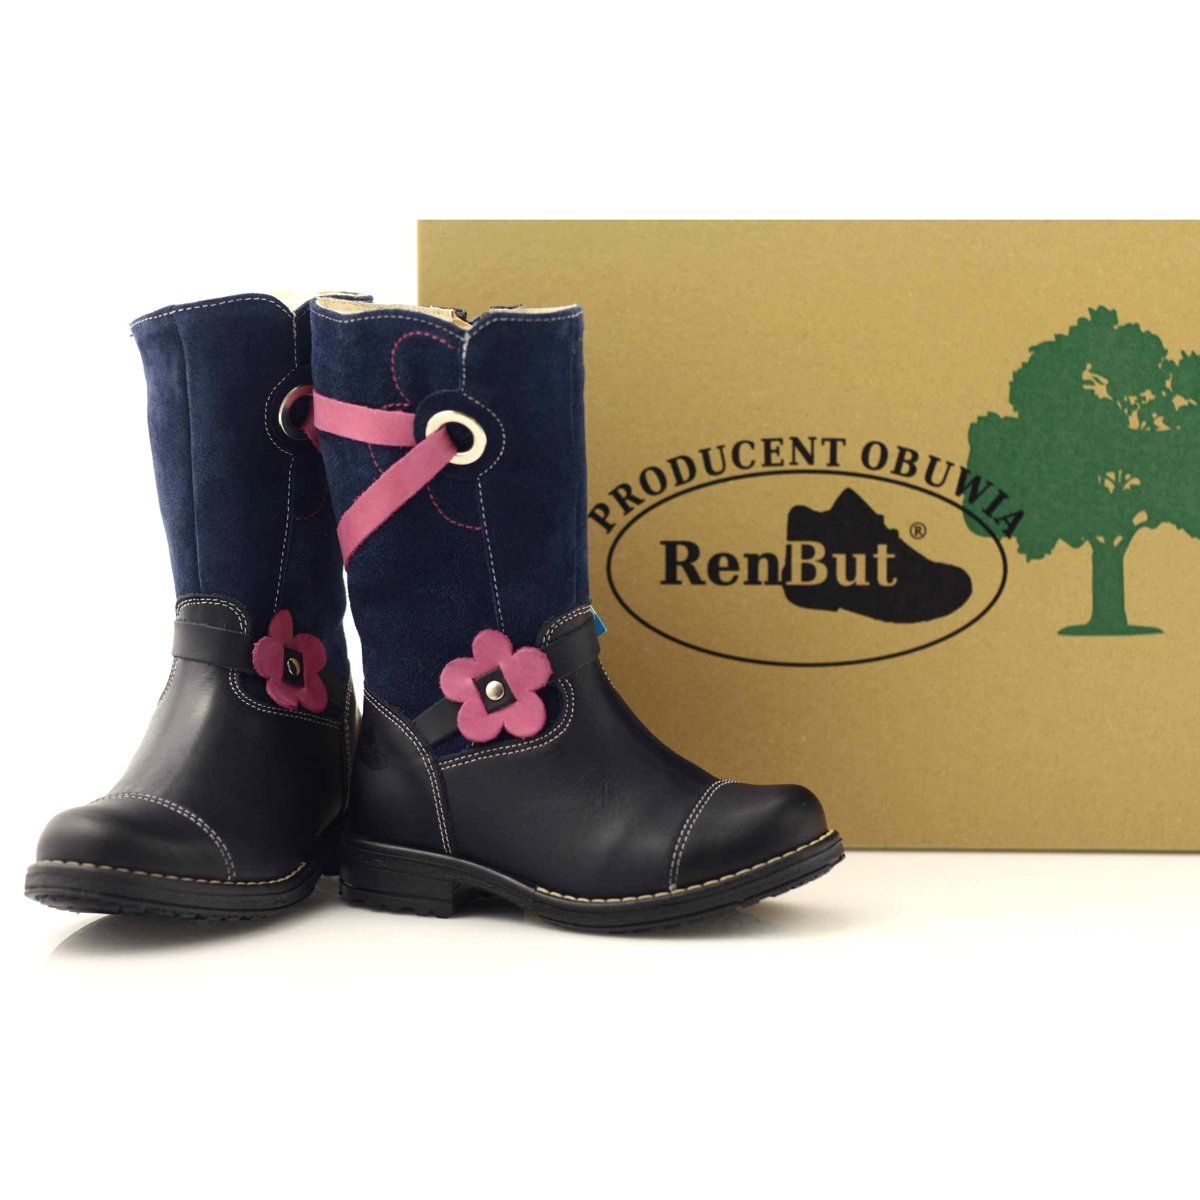 Kozaczki Buty Dzieciece Zimowe Ren But 3172 Granatowe Rozowe Boots Shoes Ugg Boots